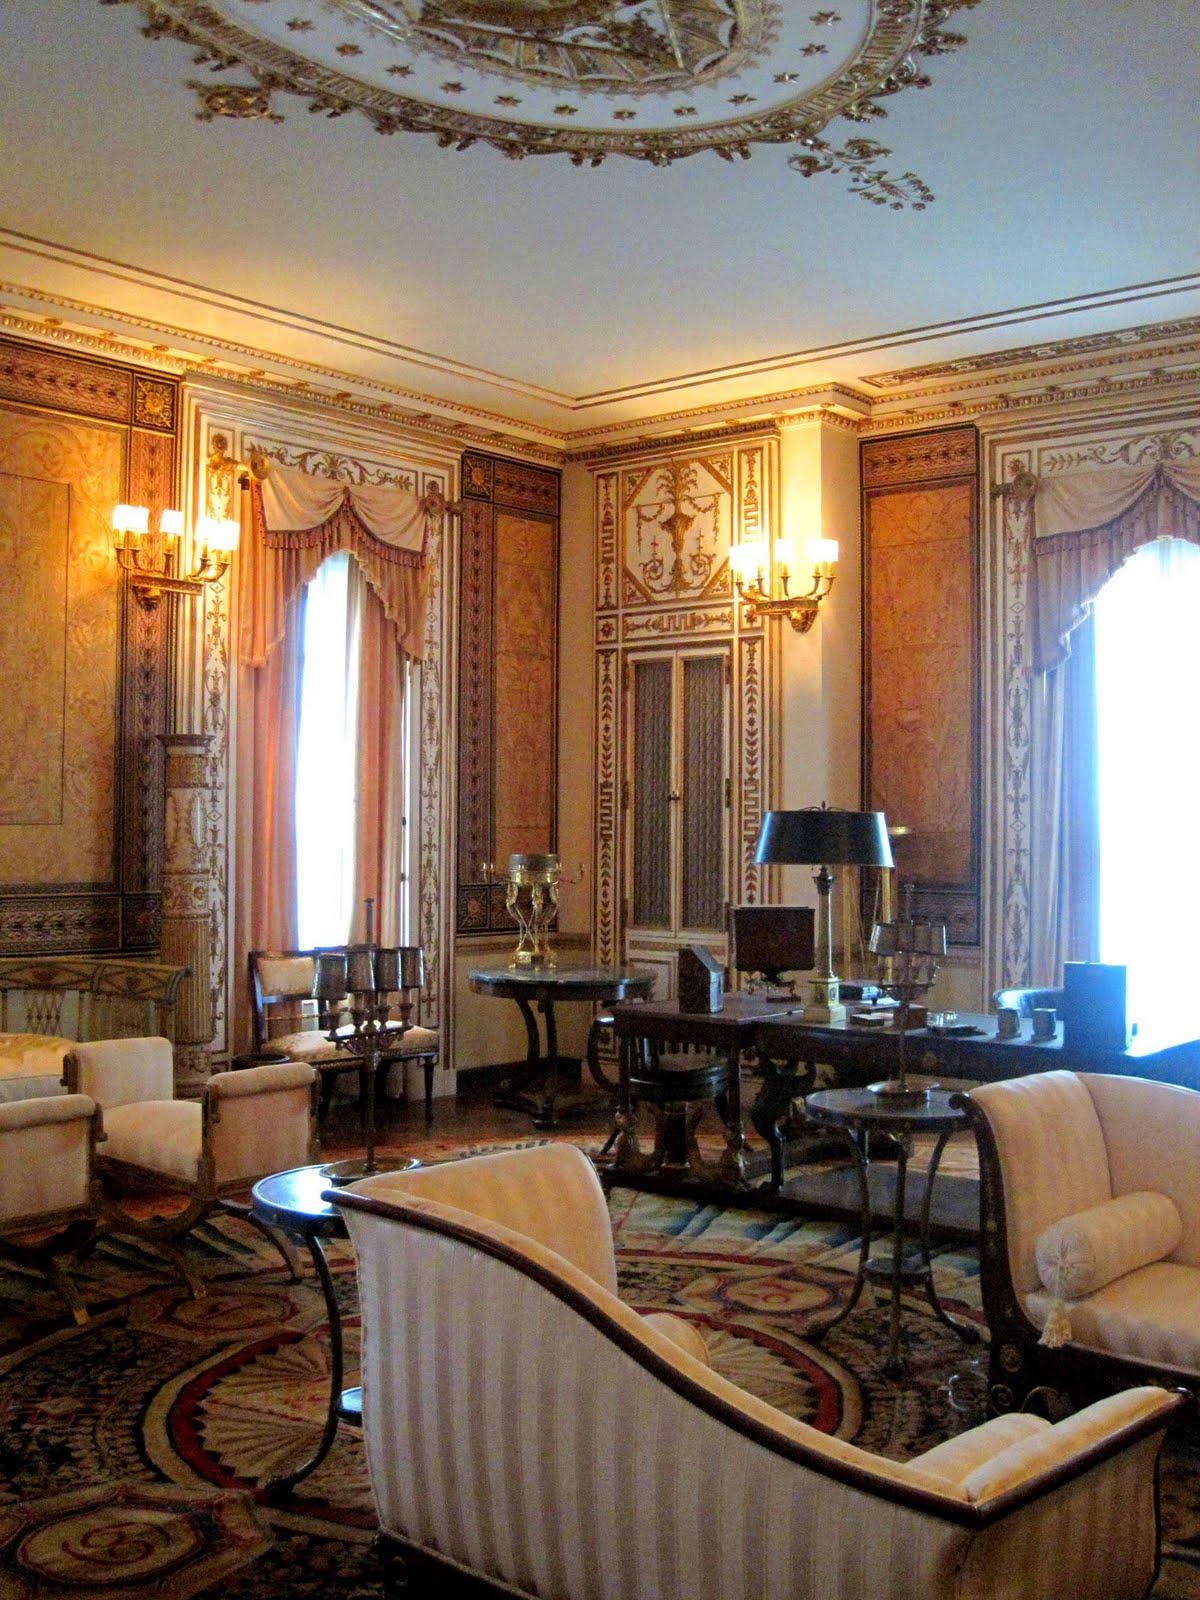 Architect design vizcaya master suite - Italian sitting room photo ...